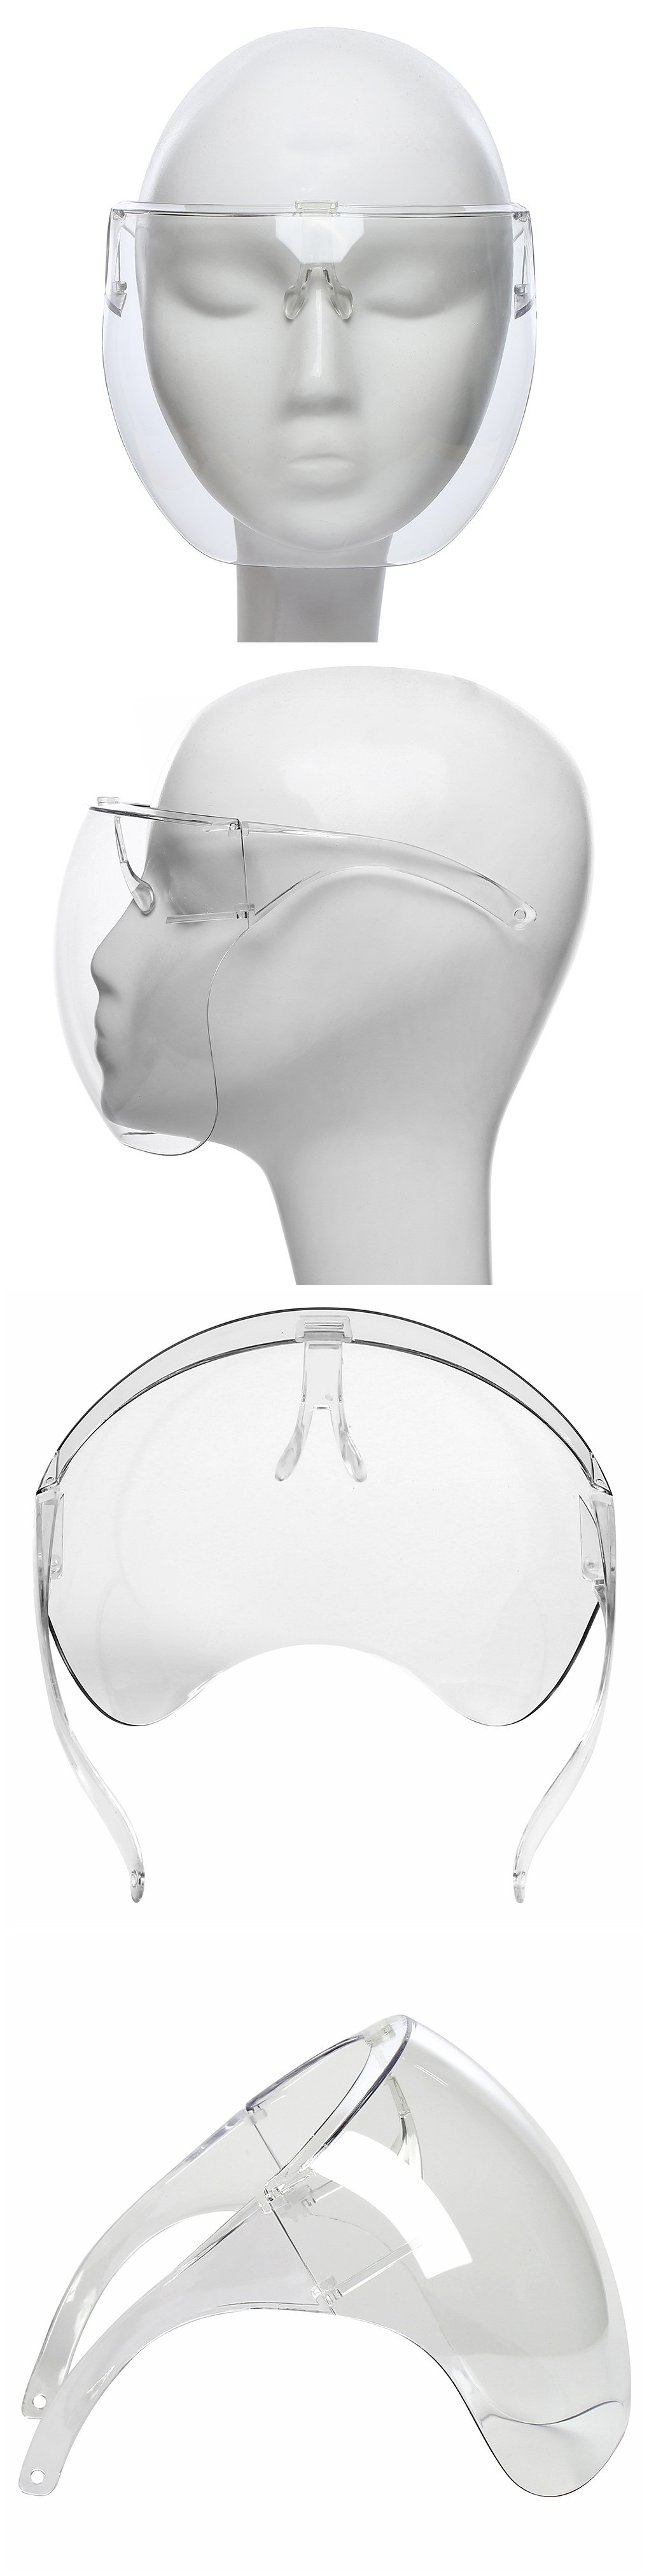 antifog face shield9.jpg